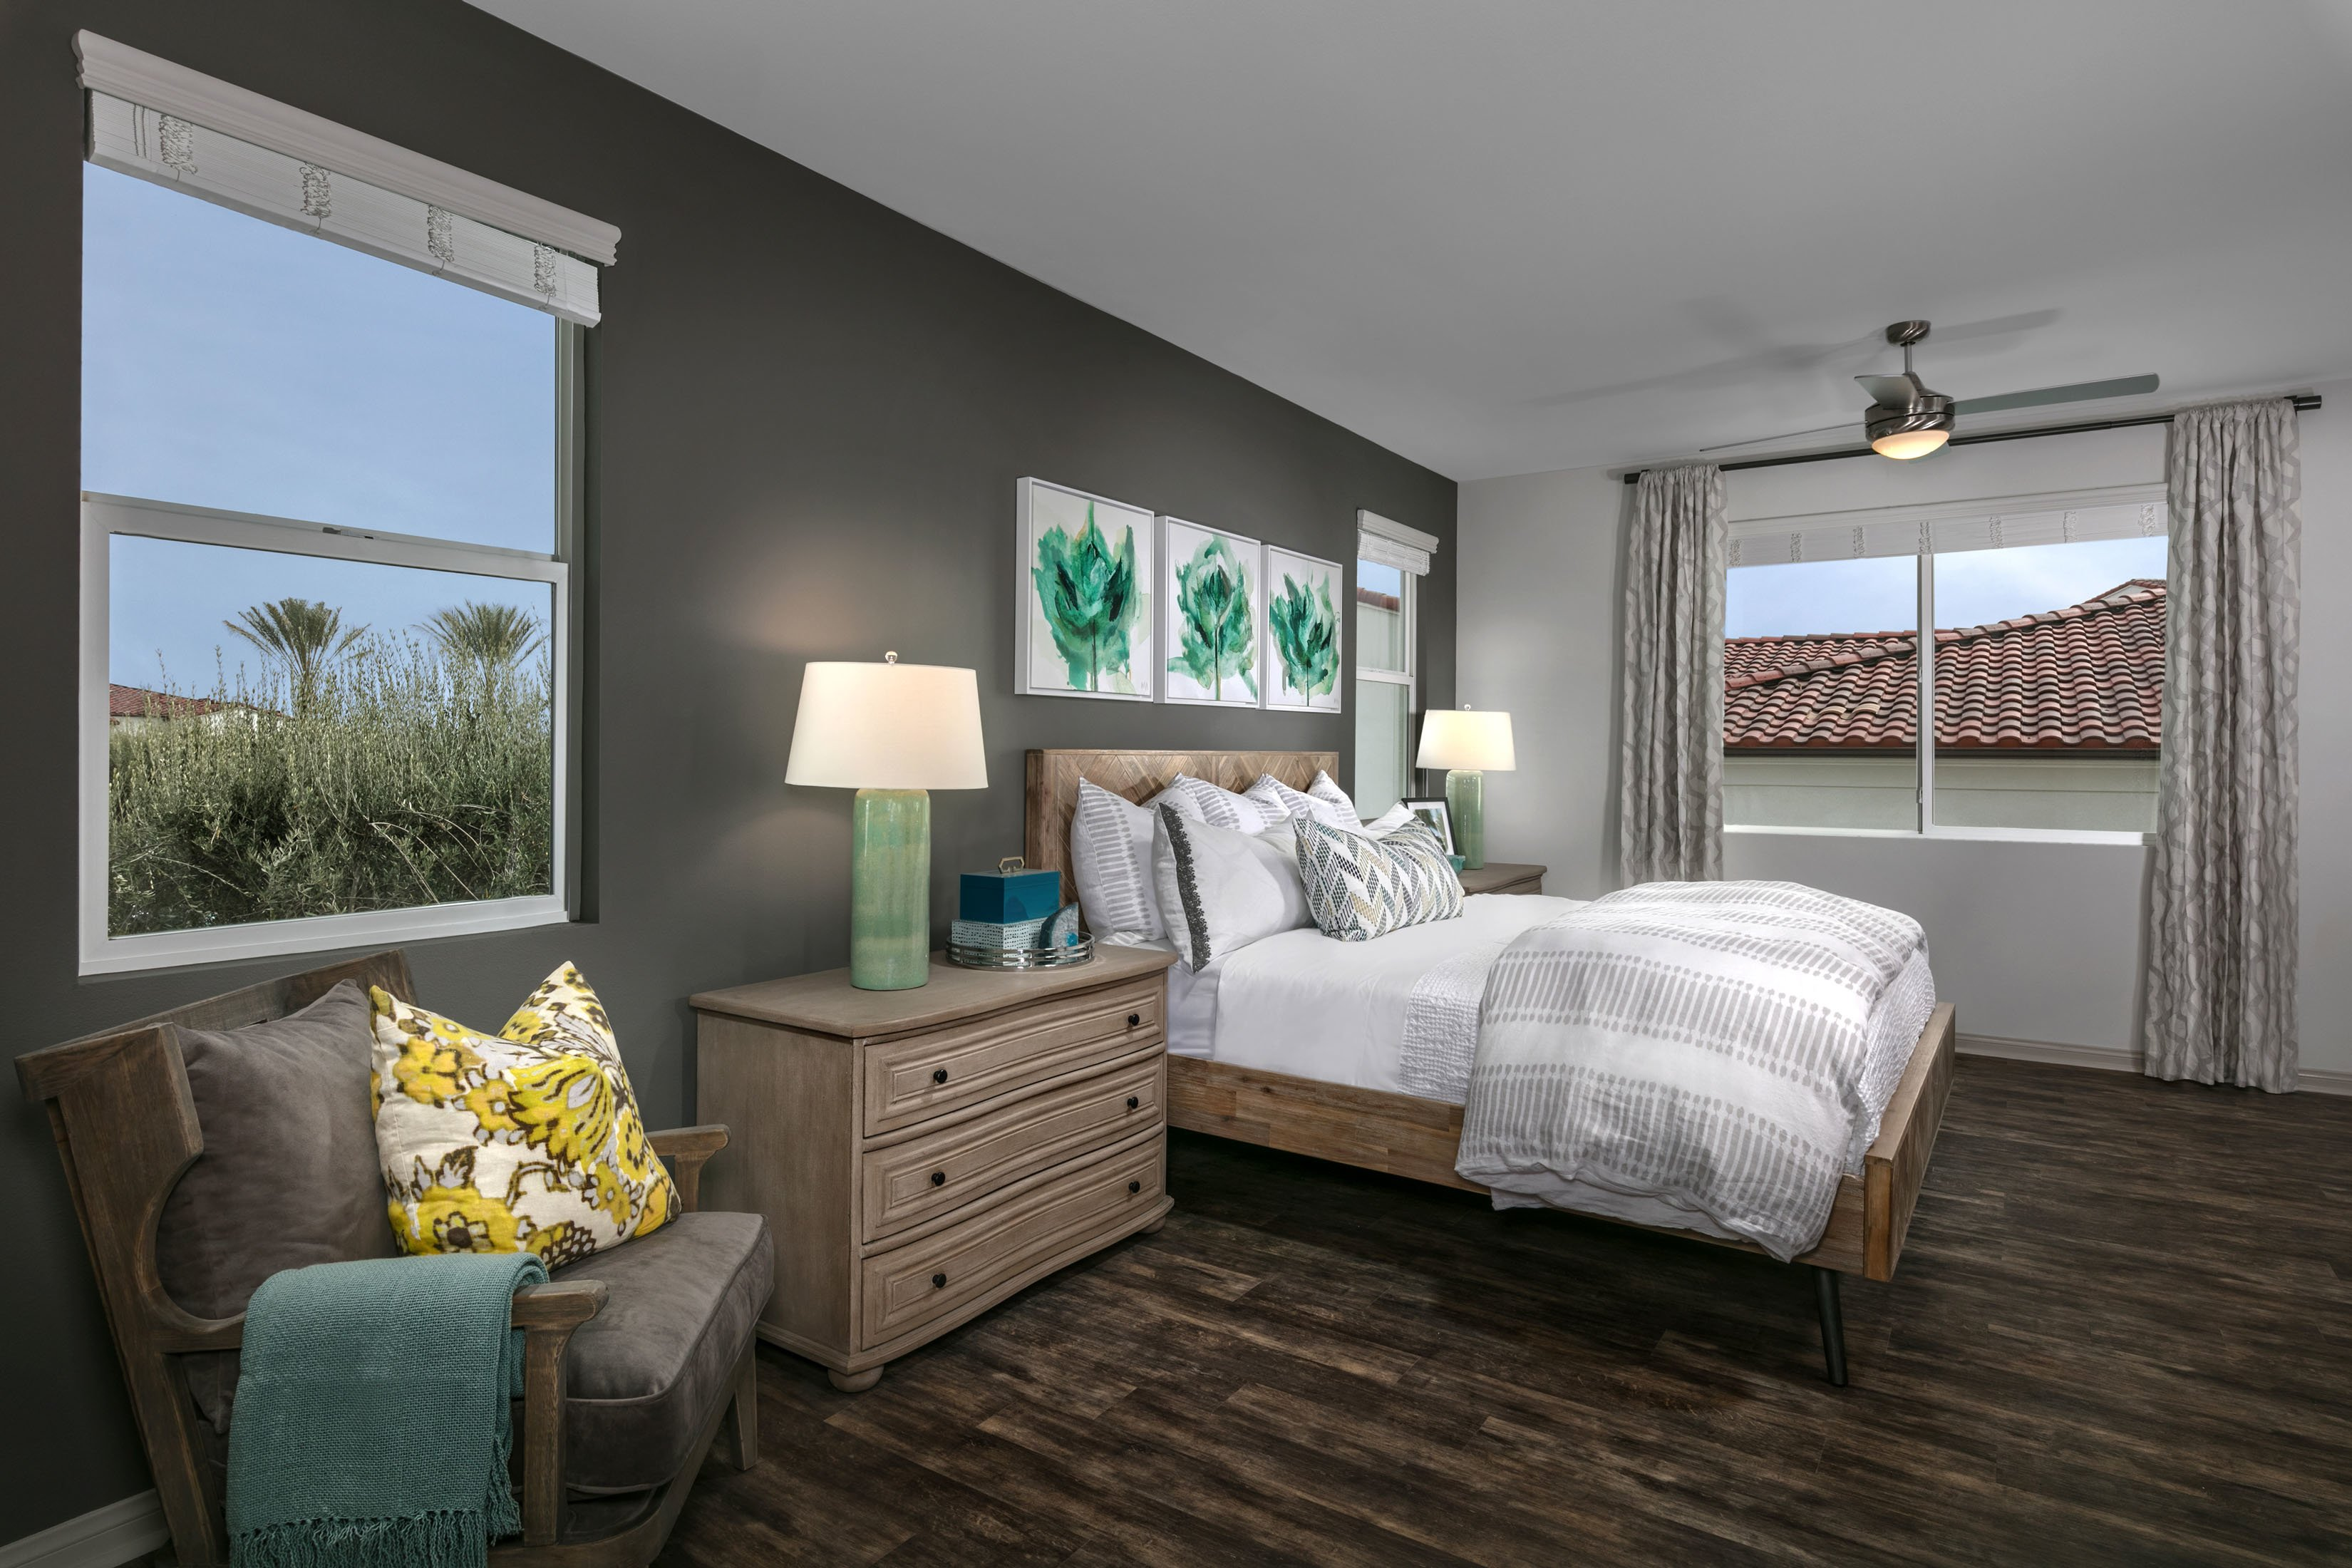 Chino Hills Apartments For Rent Santa Barbara In Chino Hills